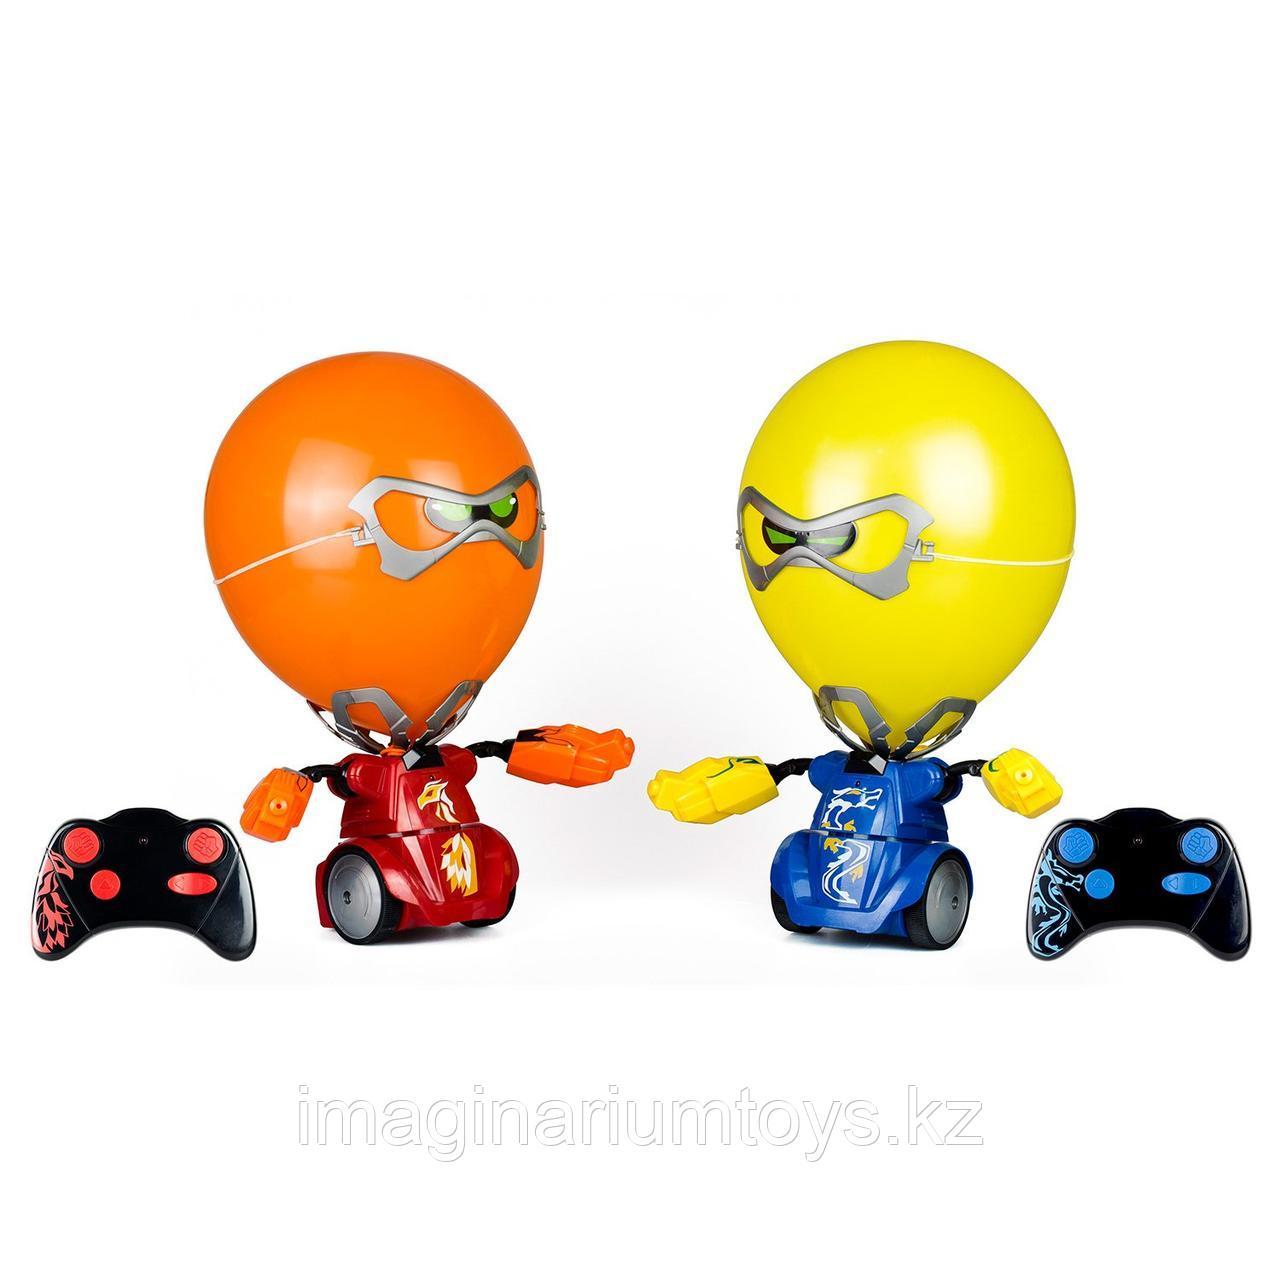 Набор роботов YCOO робокомбат шарики